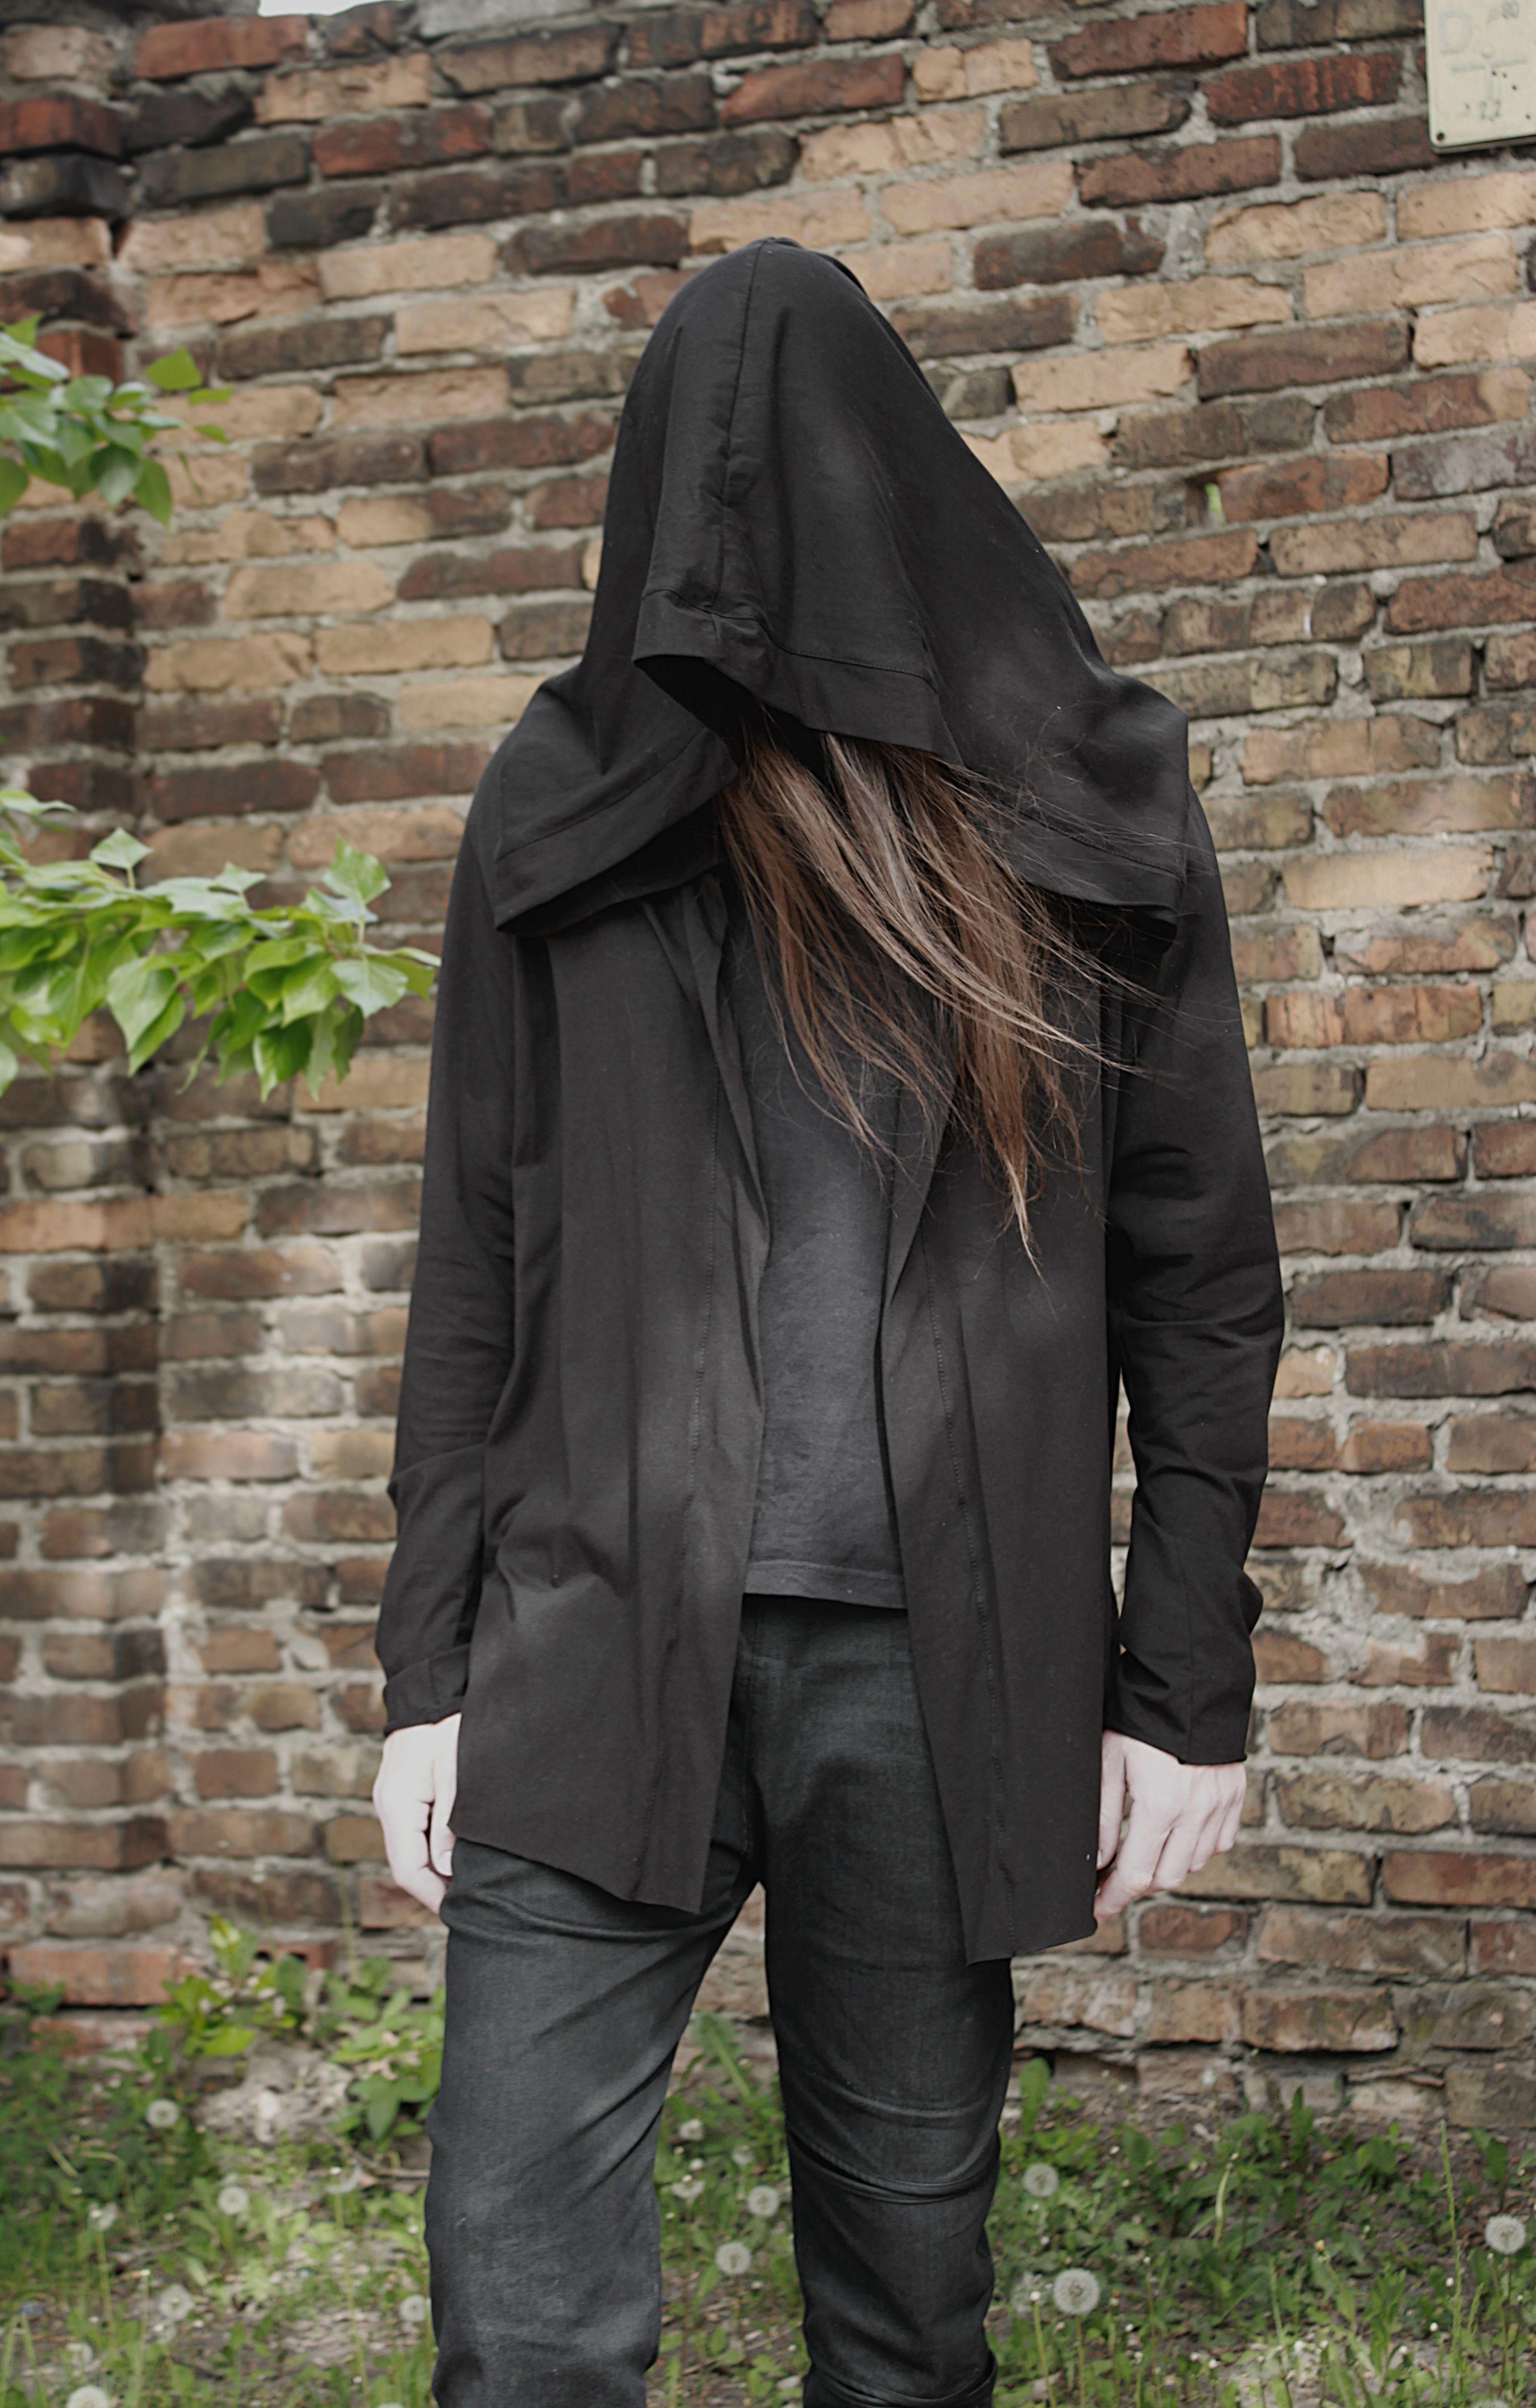 Pin on Black Fashion